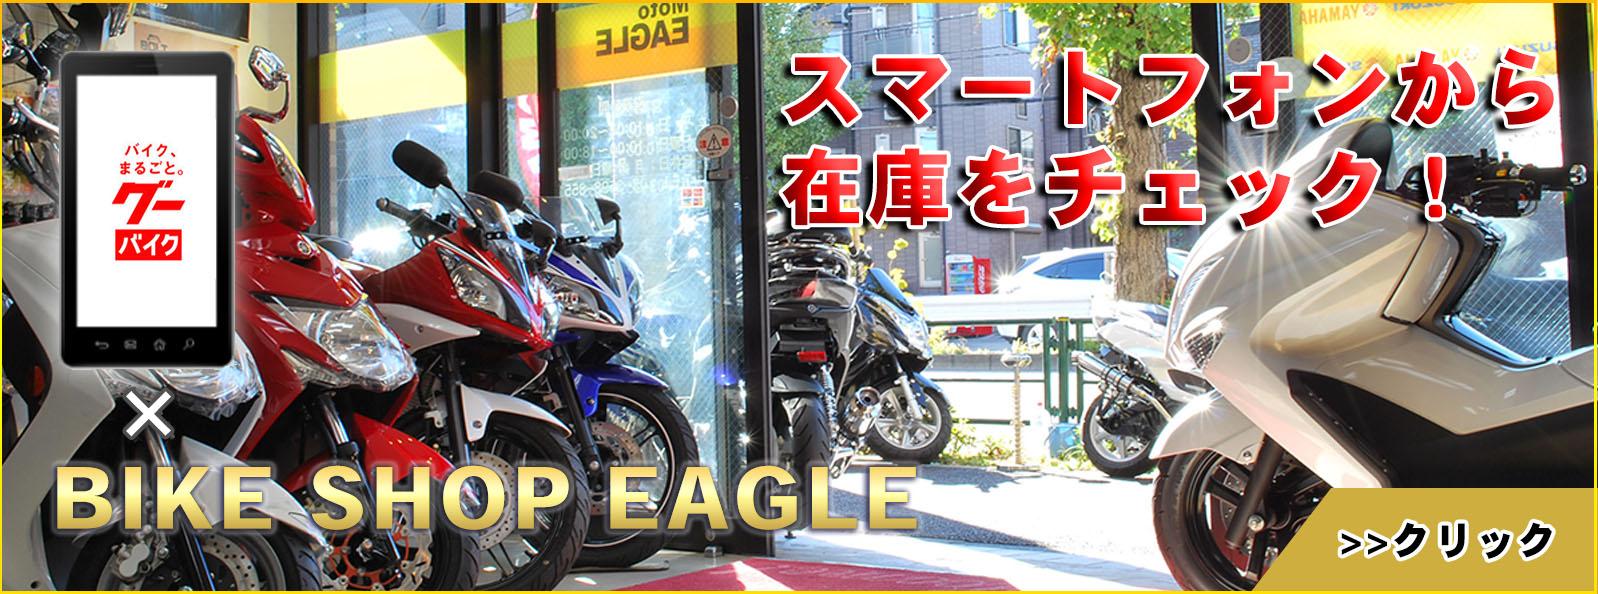 eagle_goo_mobile